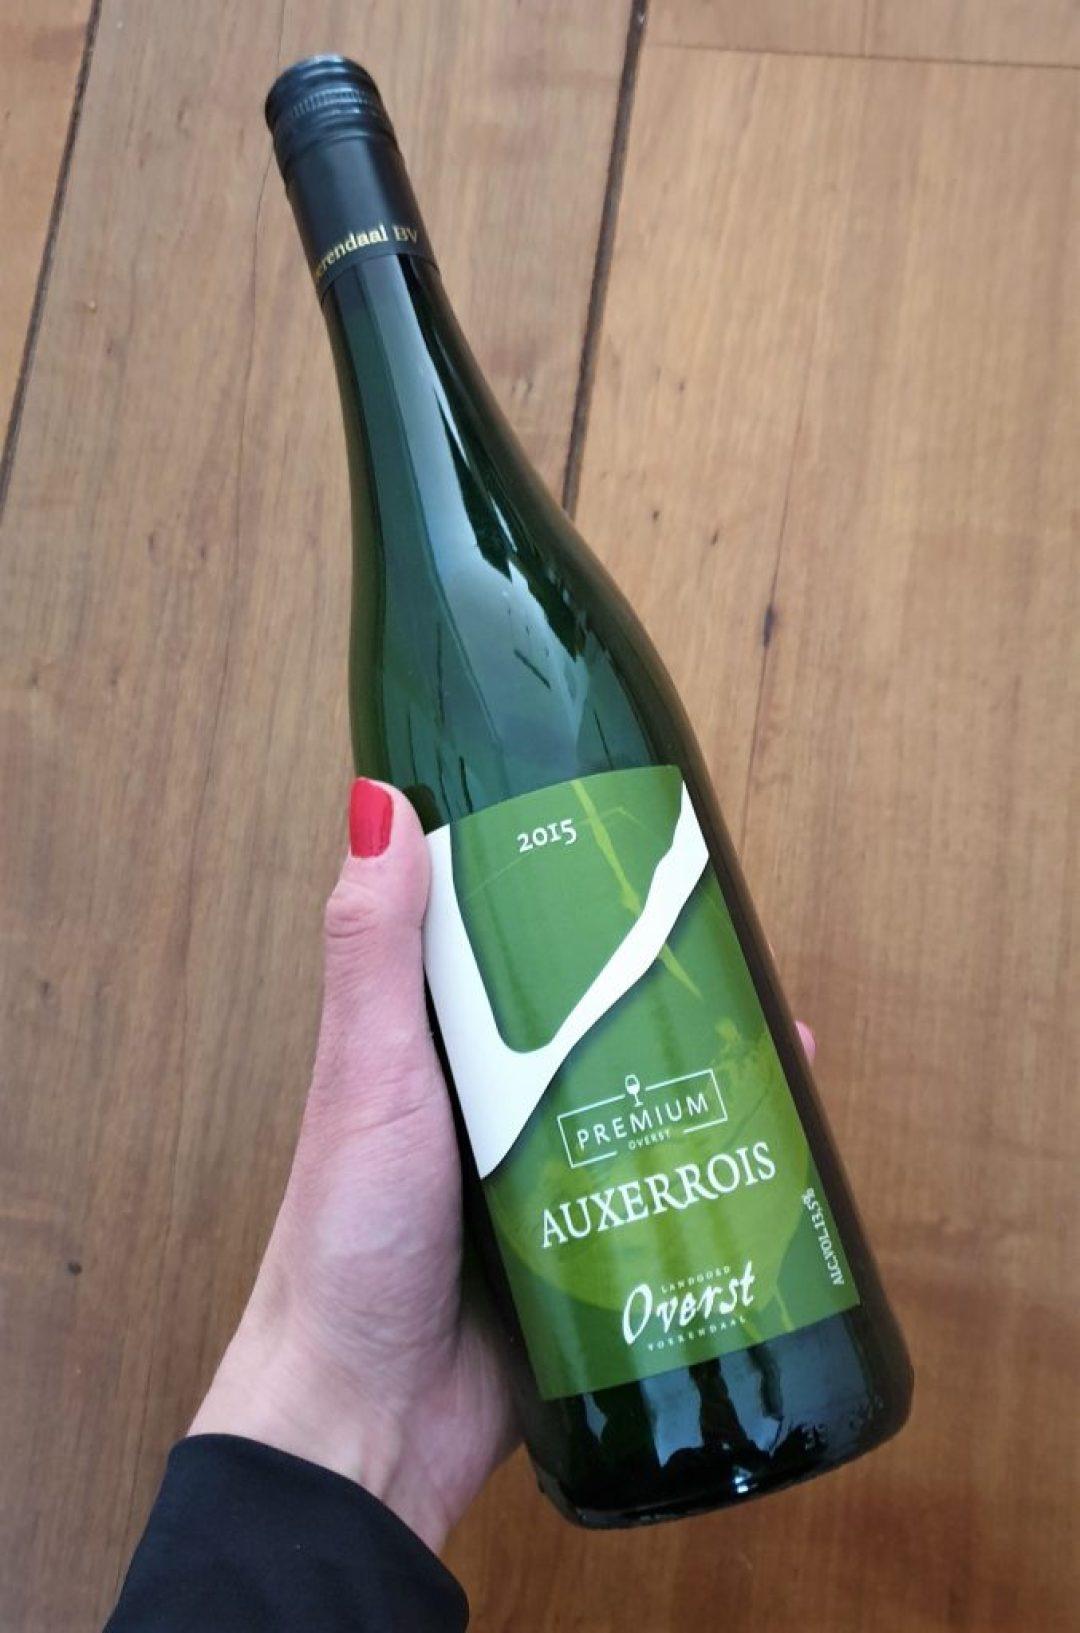 wijnreis naar Limburg: Auxerrois Overst